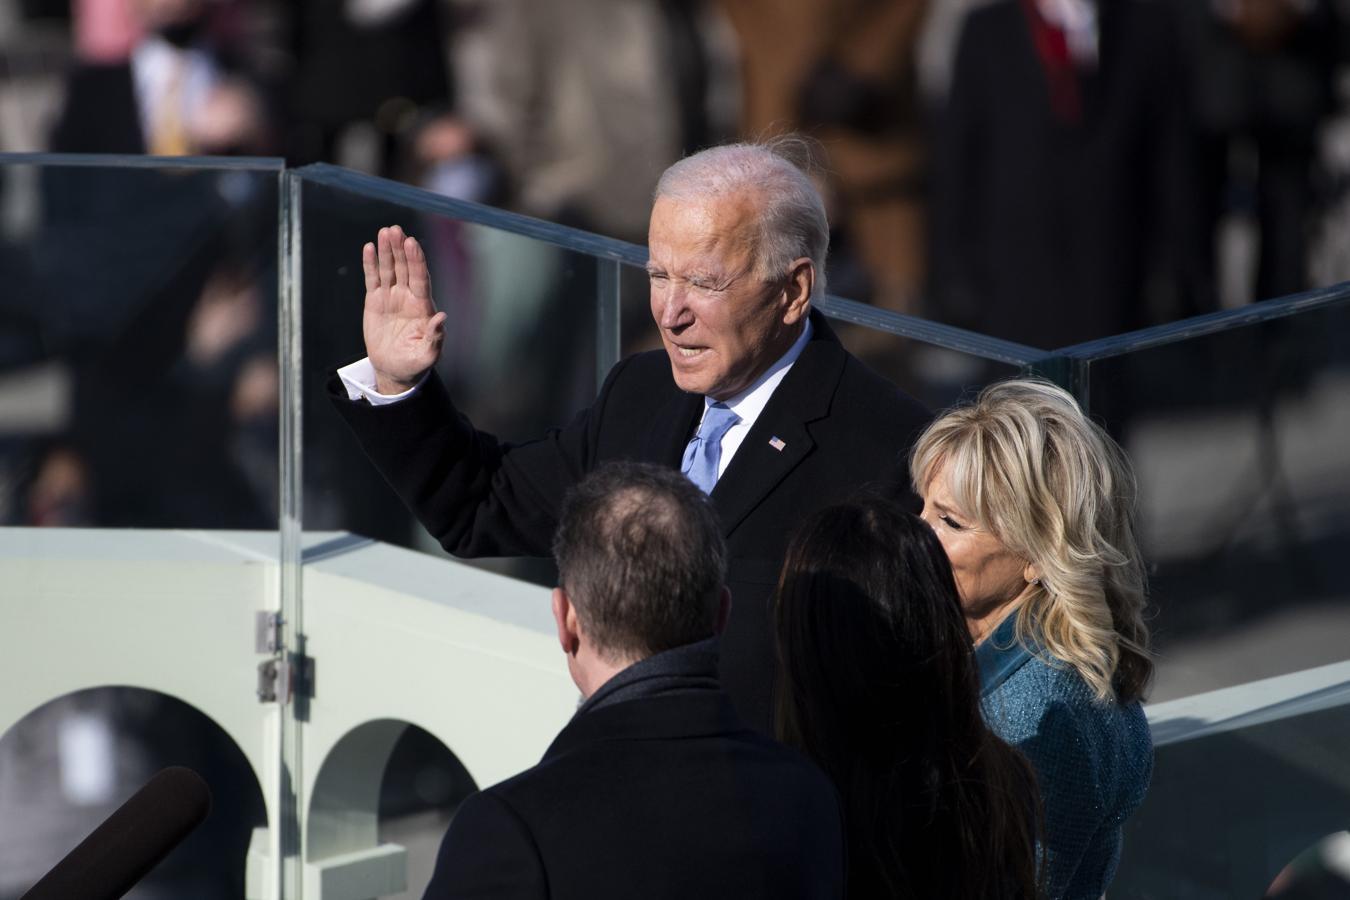 Momento en el que Joe Biden ha jurado como presidente